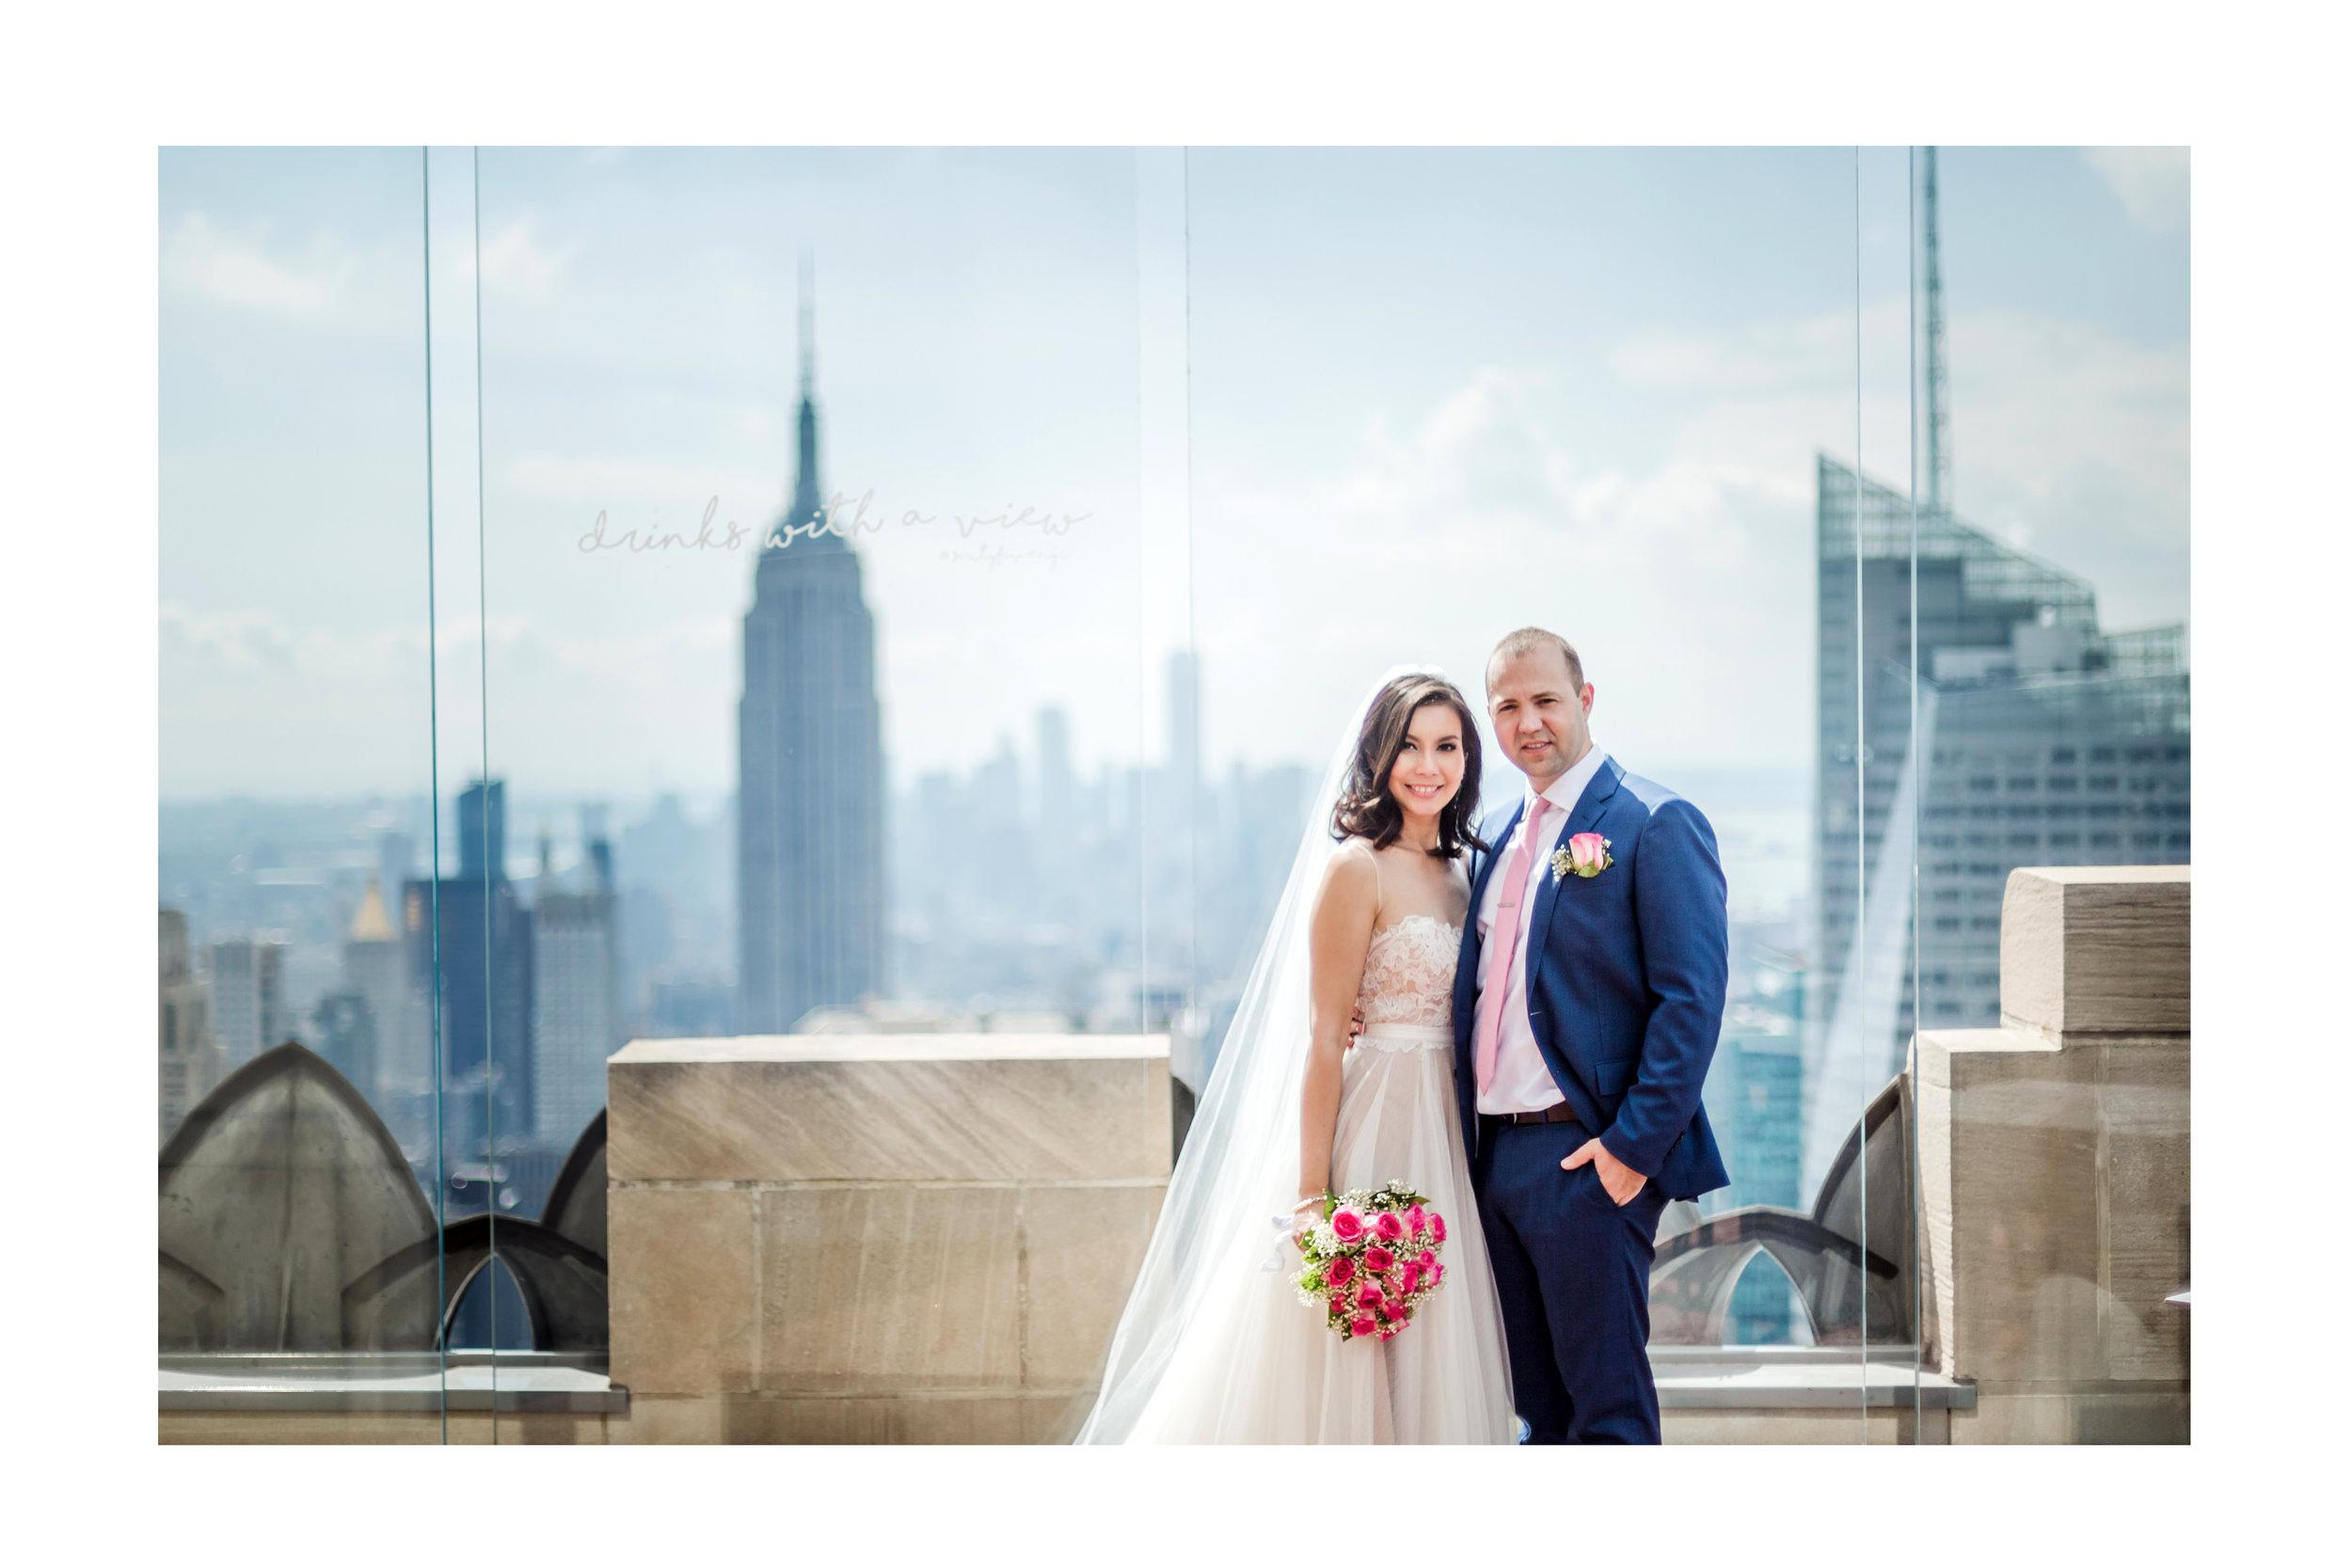 Eve&Jules_Wedding_Day_015.jpg